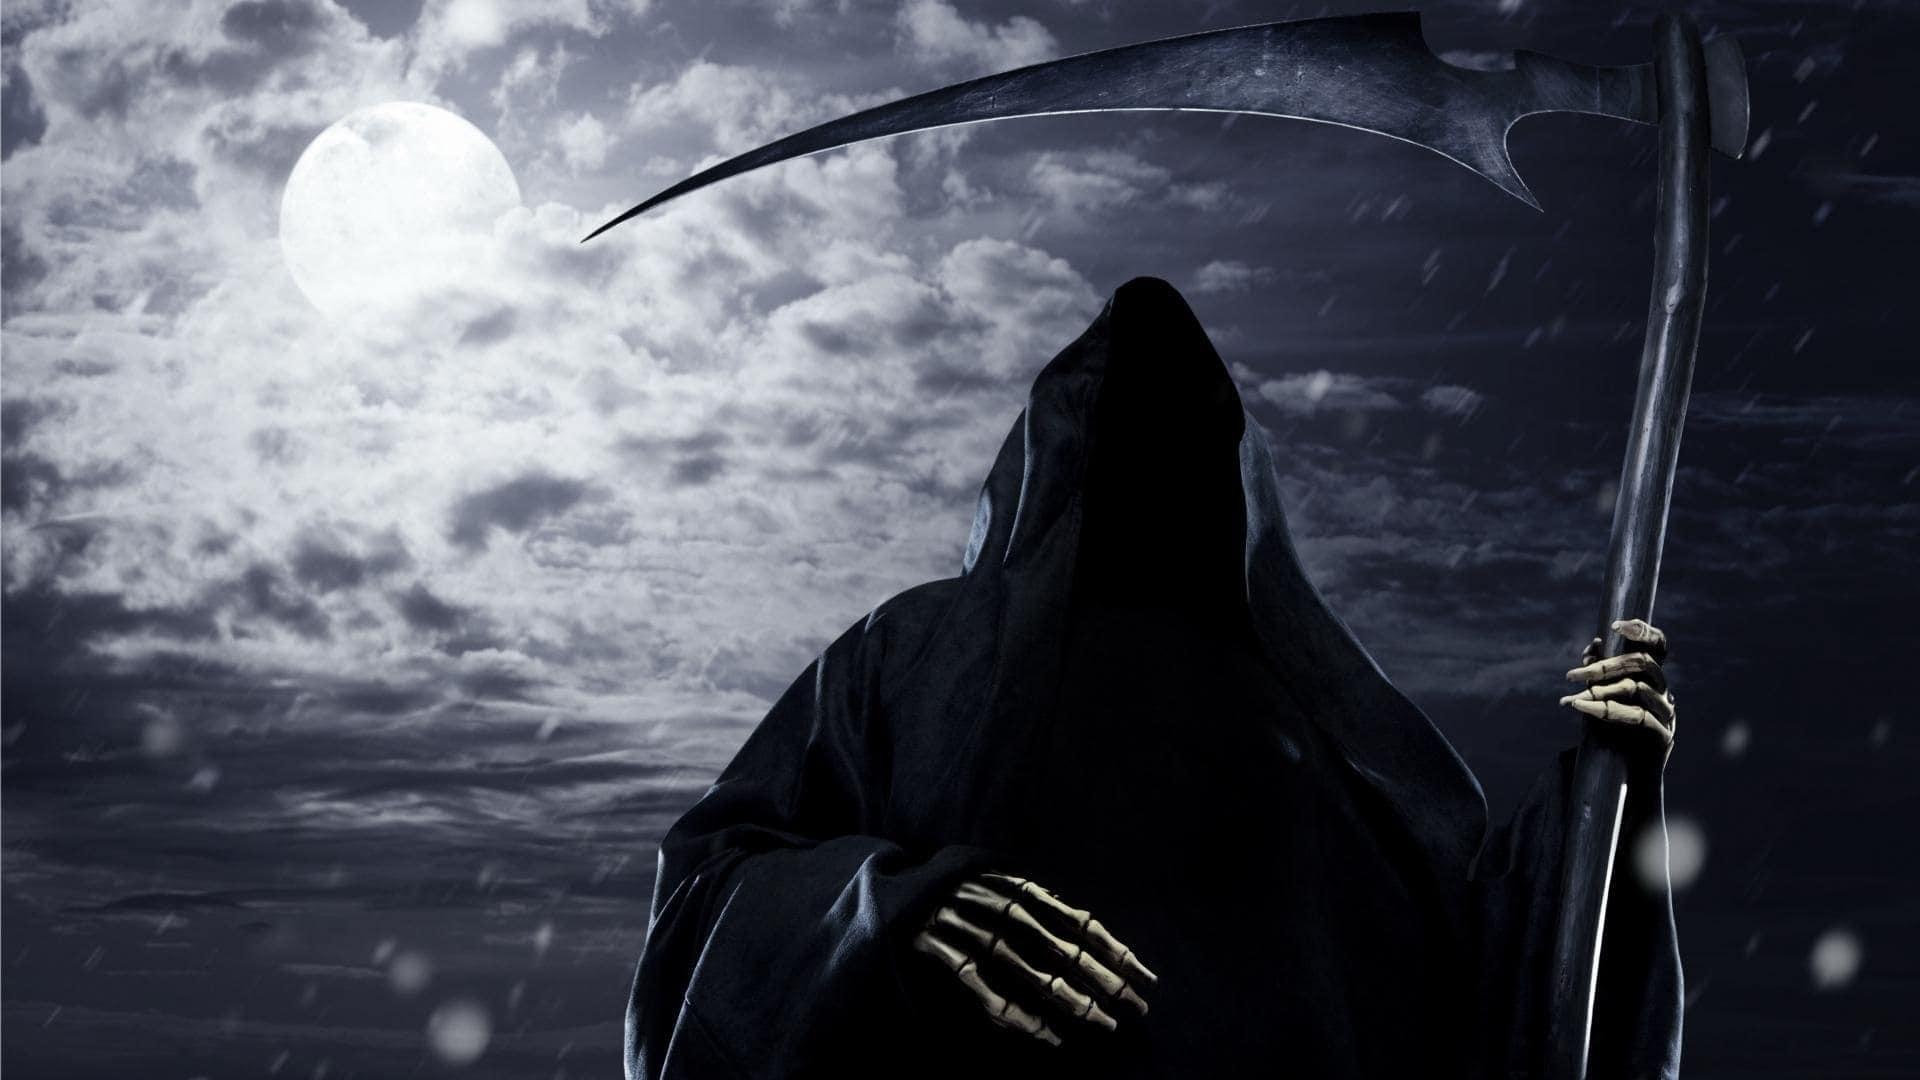 death dream meaning, dream about death, death dream interpretation, seeing in a dream death